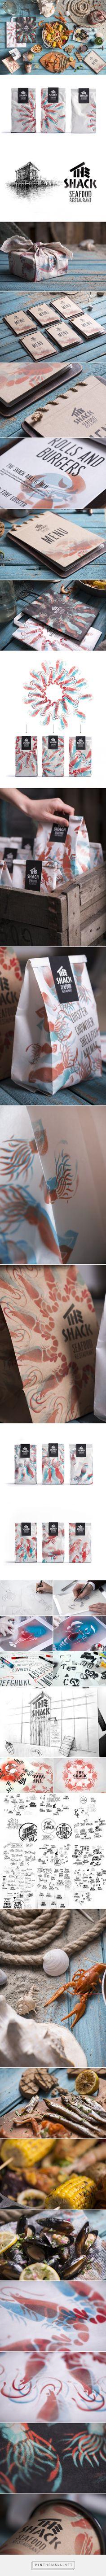 The Shack seafood packaging designed by Backbone Branding - http://www.packagingoftheworld.com/2016/02/the-shack.html